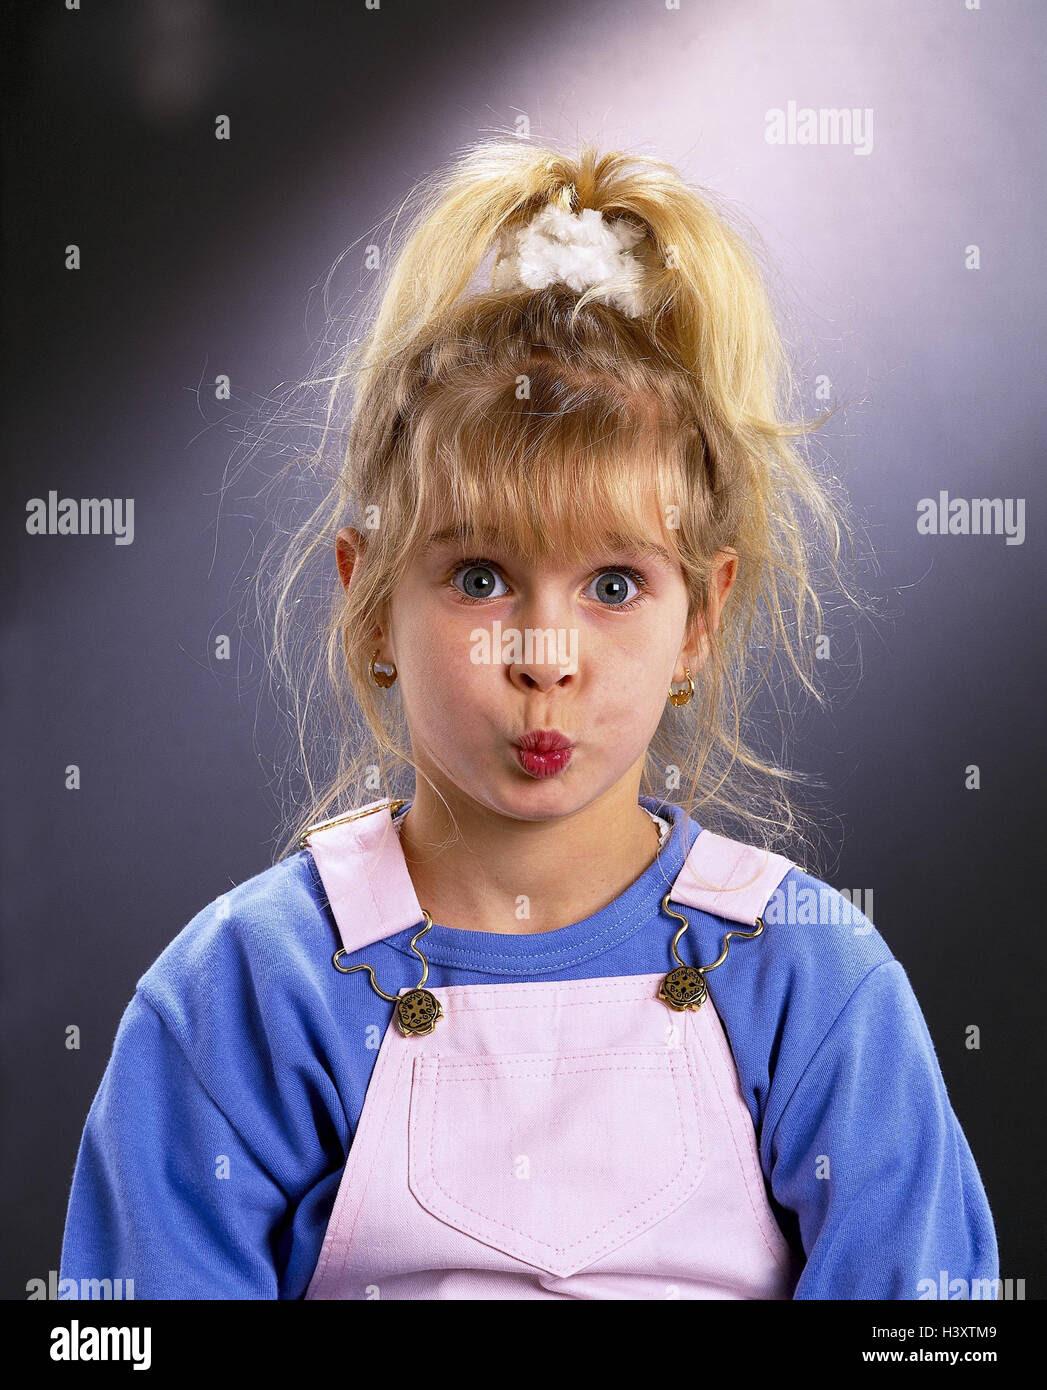 Frisuren Kinder Haare Frisur Kamm Kind Kämmen Mädchen Mädchen Kinder